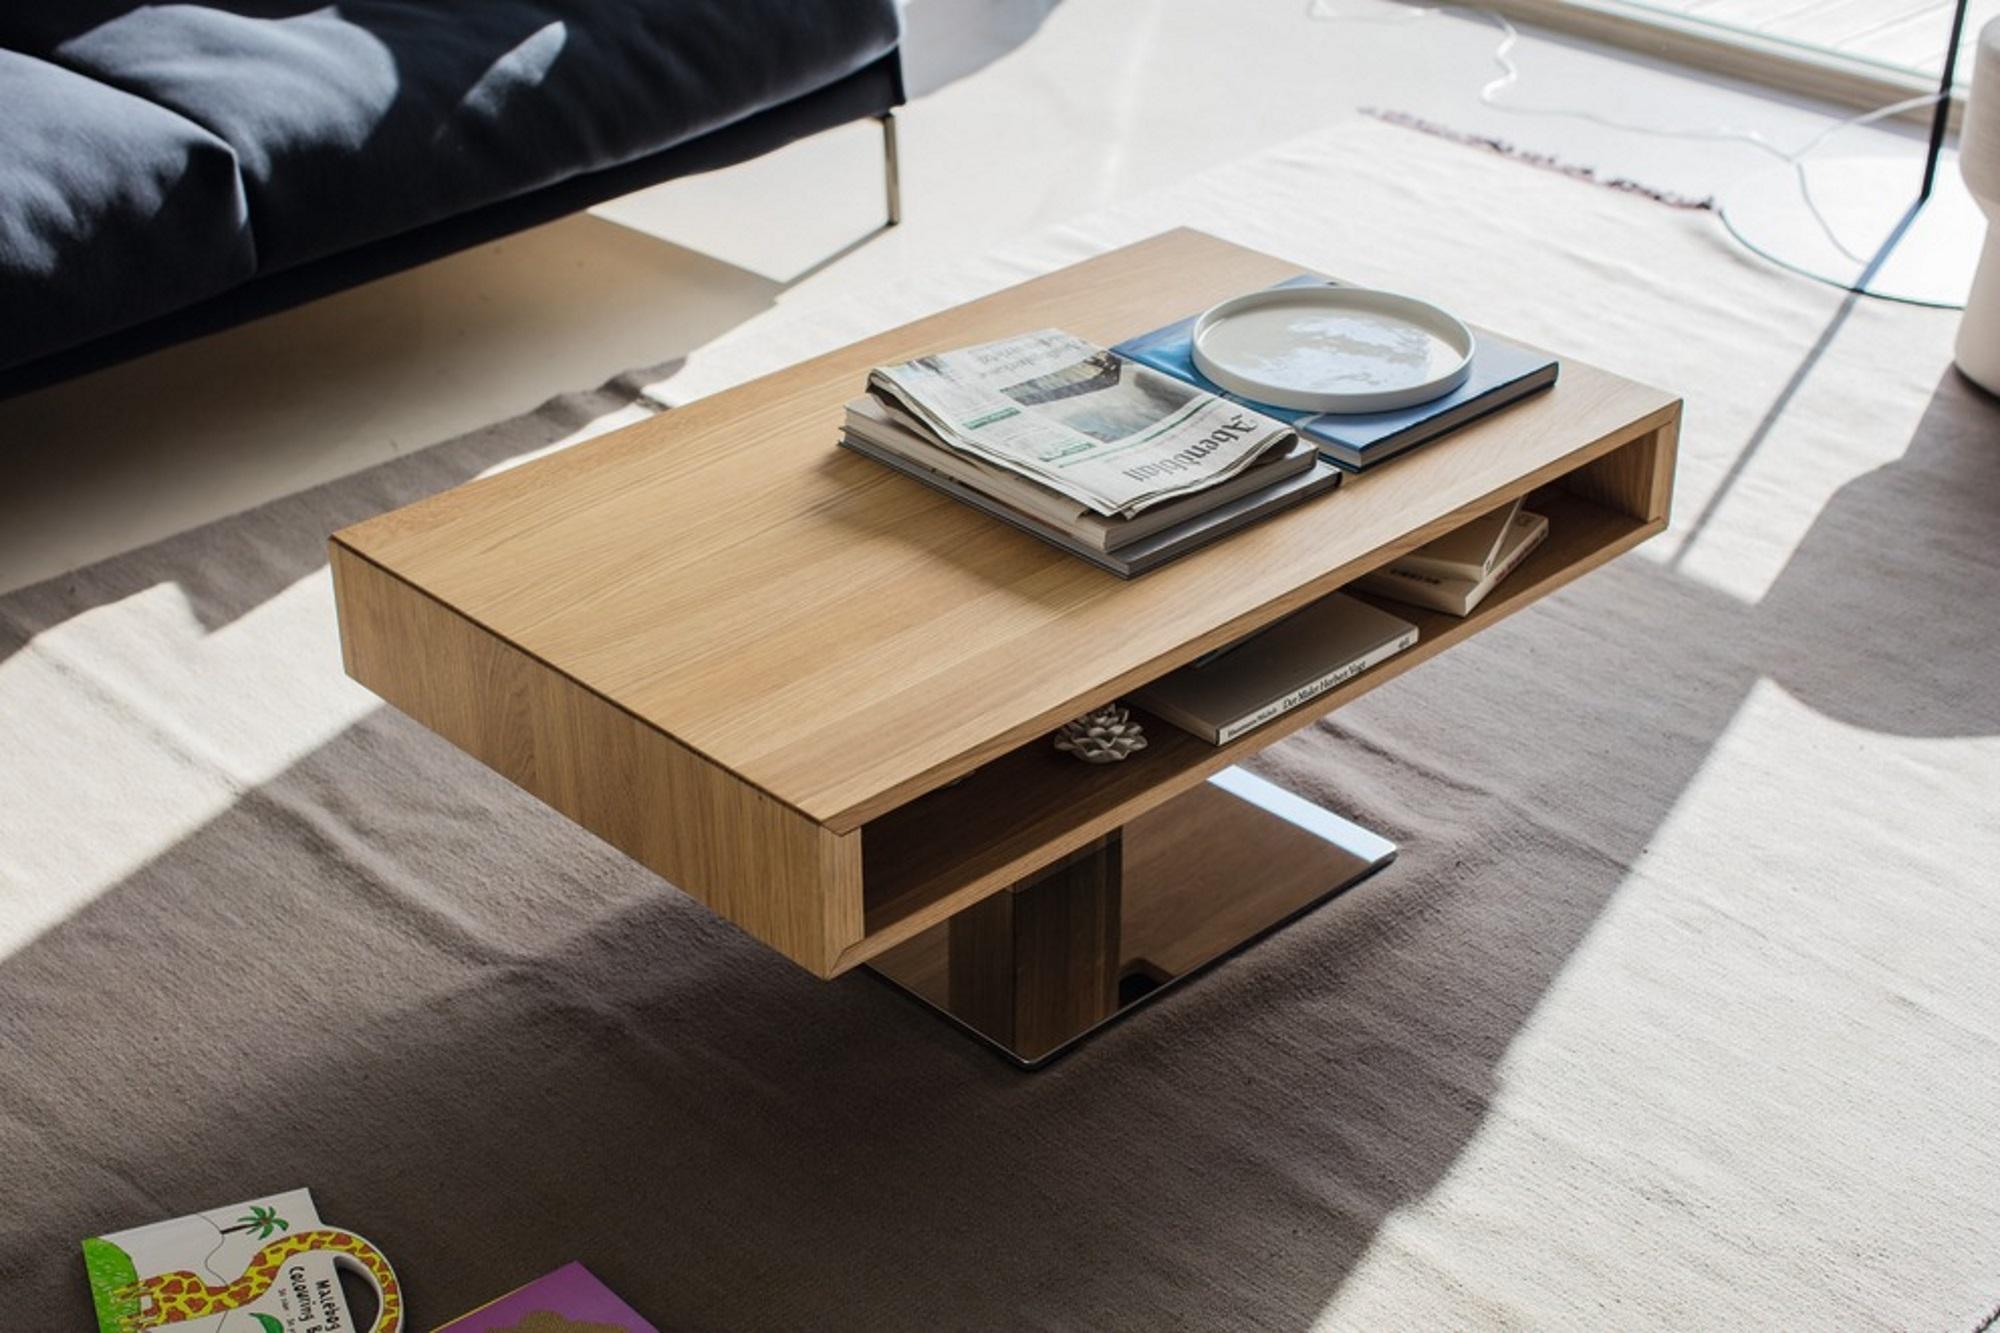 couchtisch lift 23512720171020. Black Bedroom Furniture Sets. Home Design Ideas